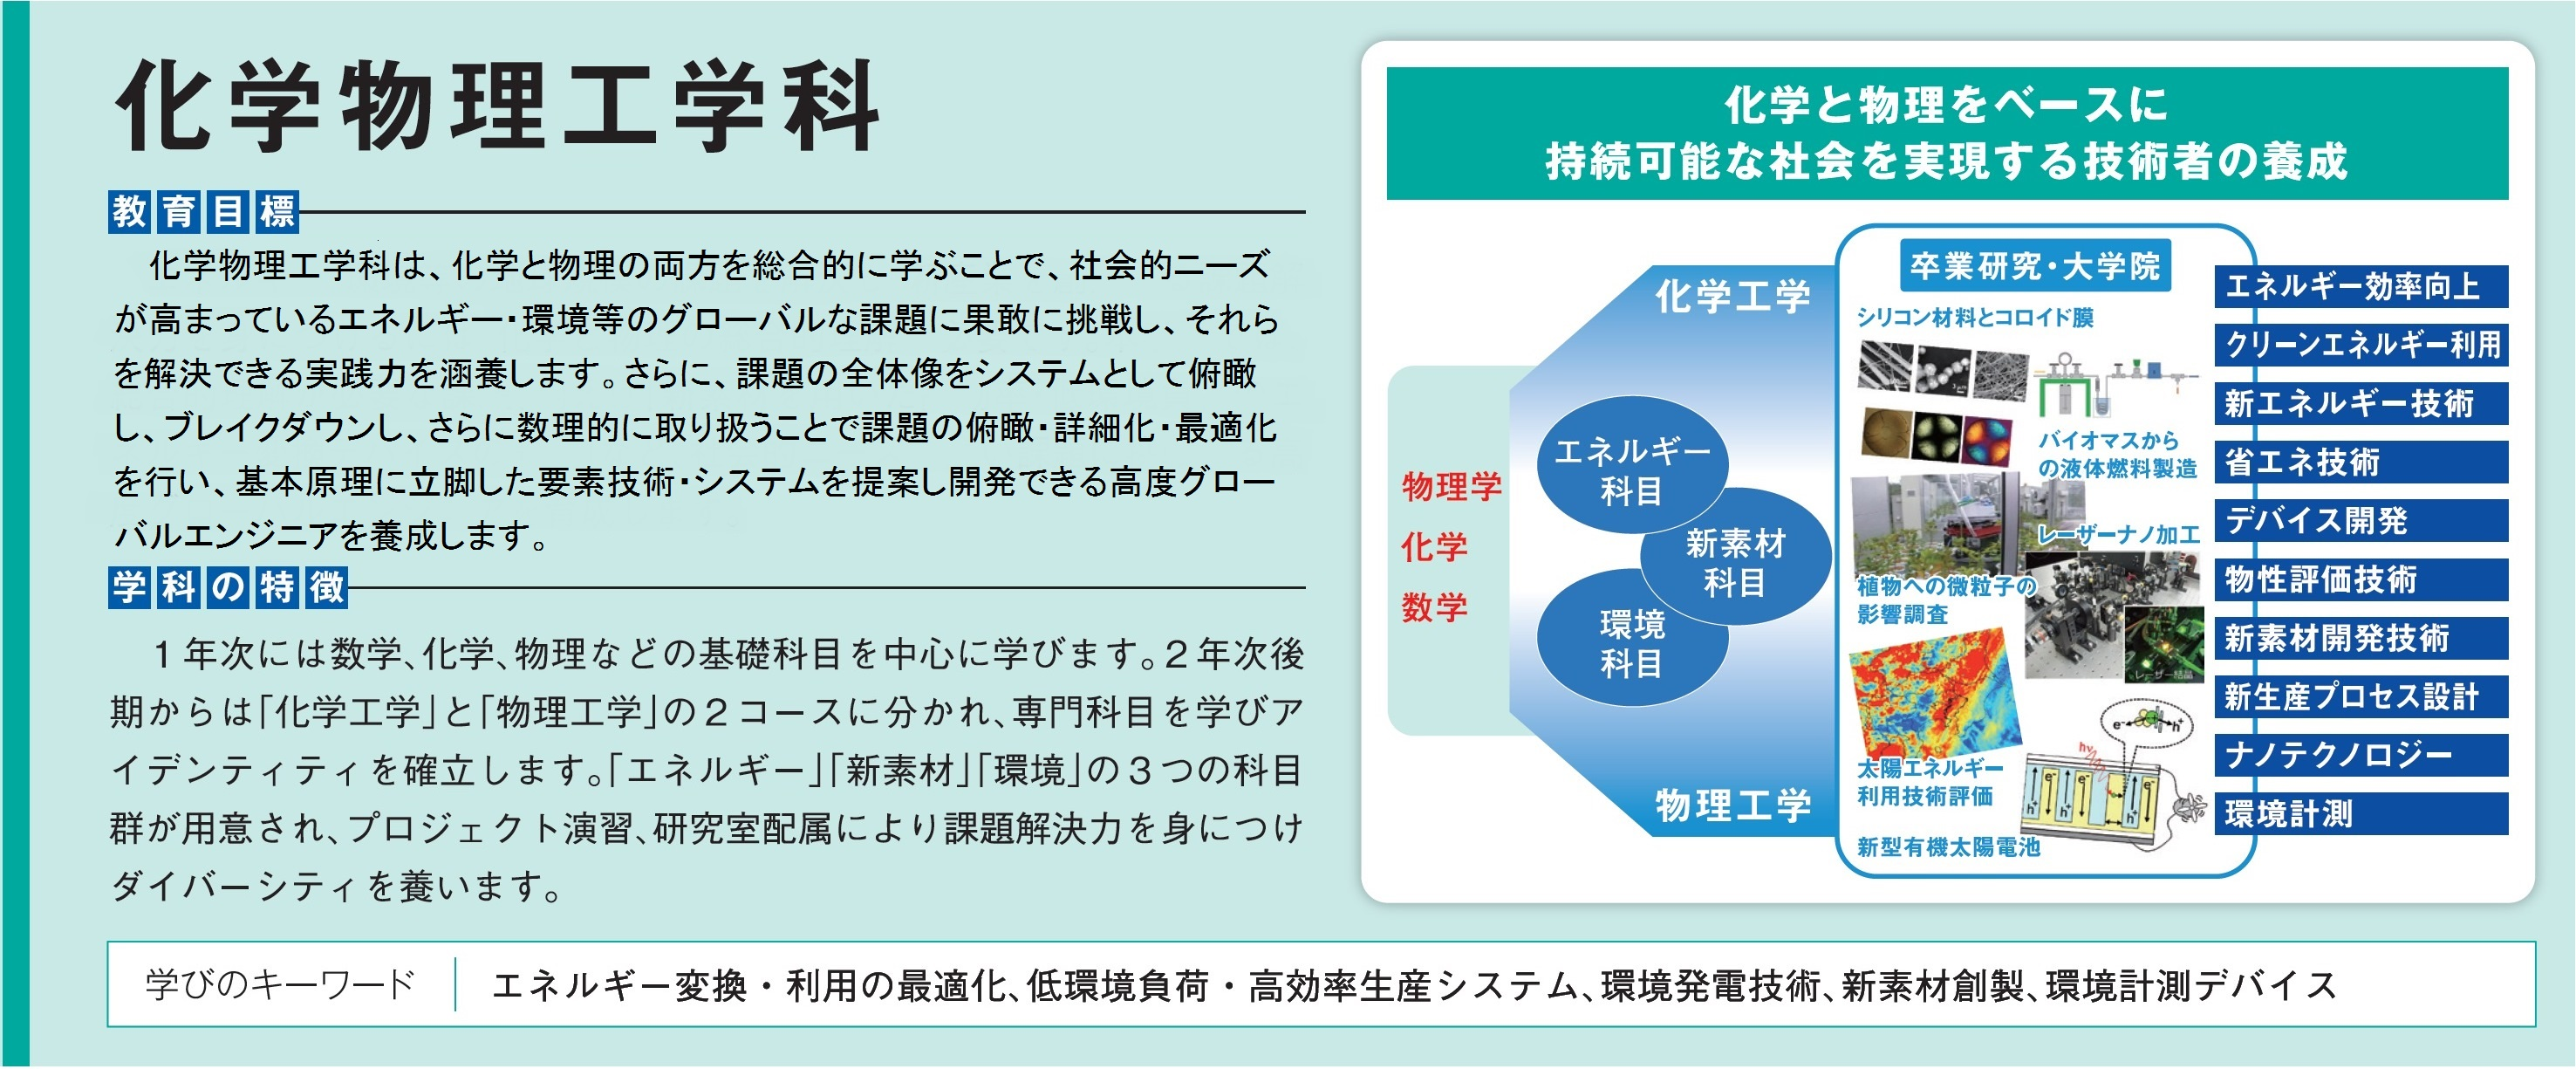 20180112_06_tuat_engineering_kaiso_kagakubuturi_1